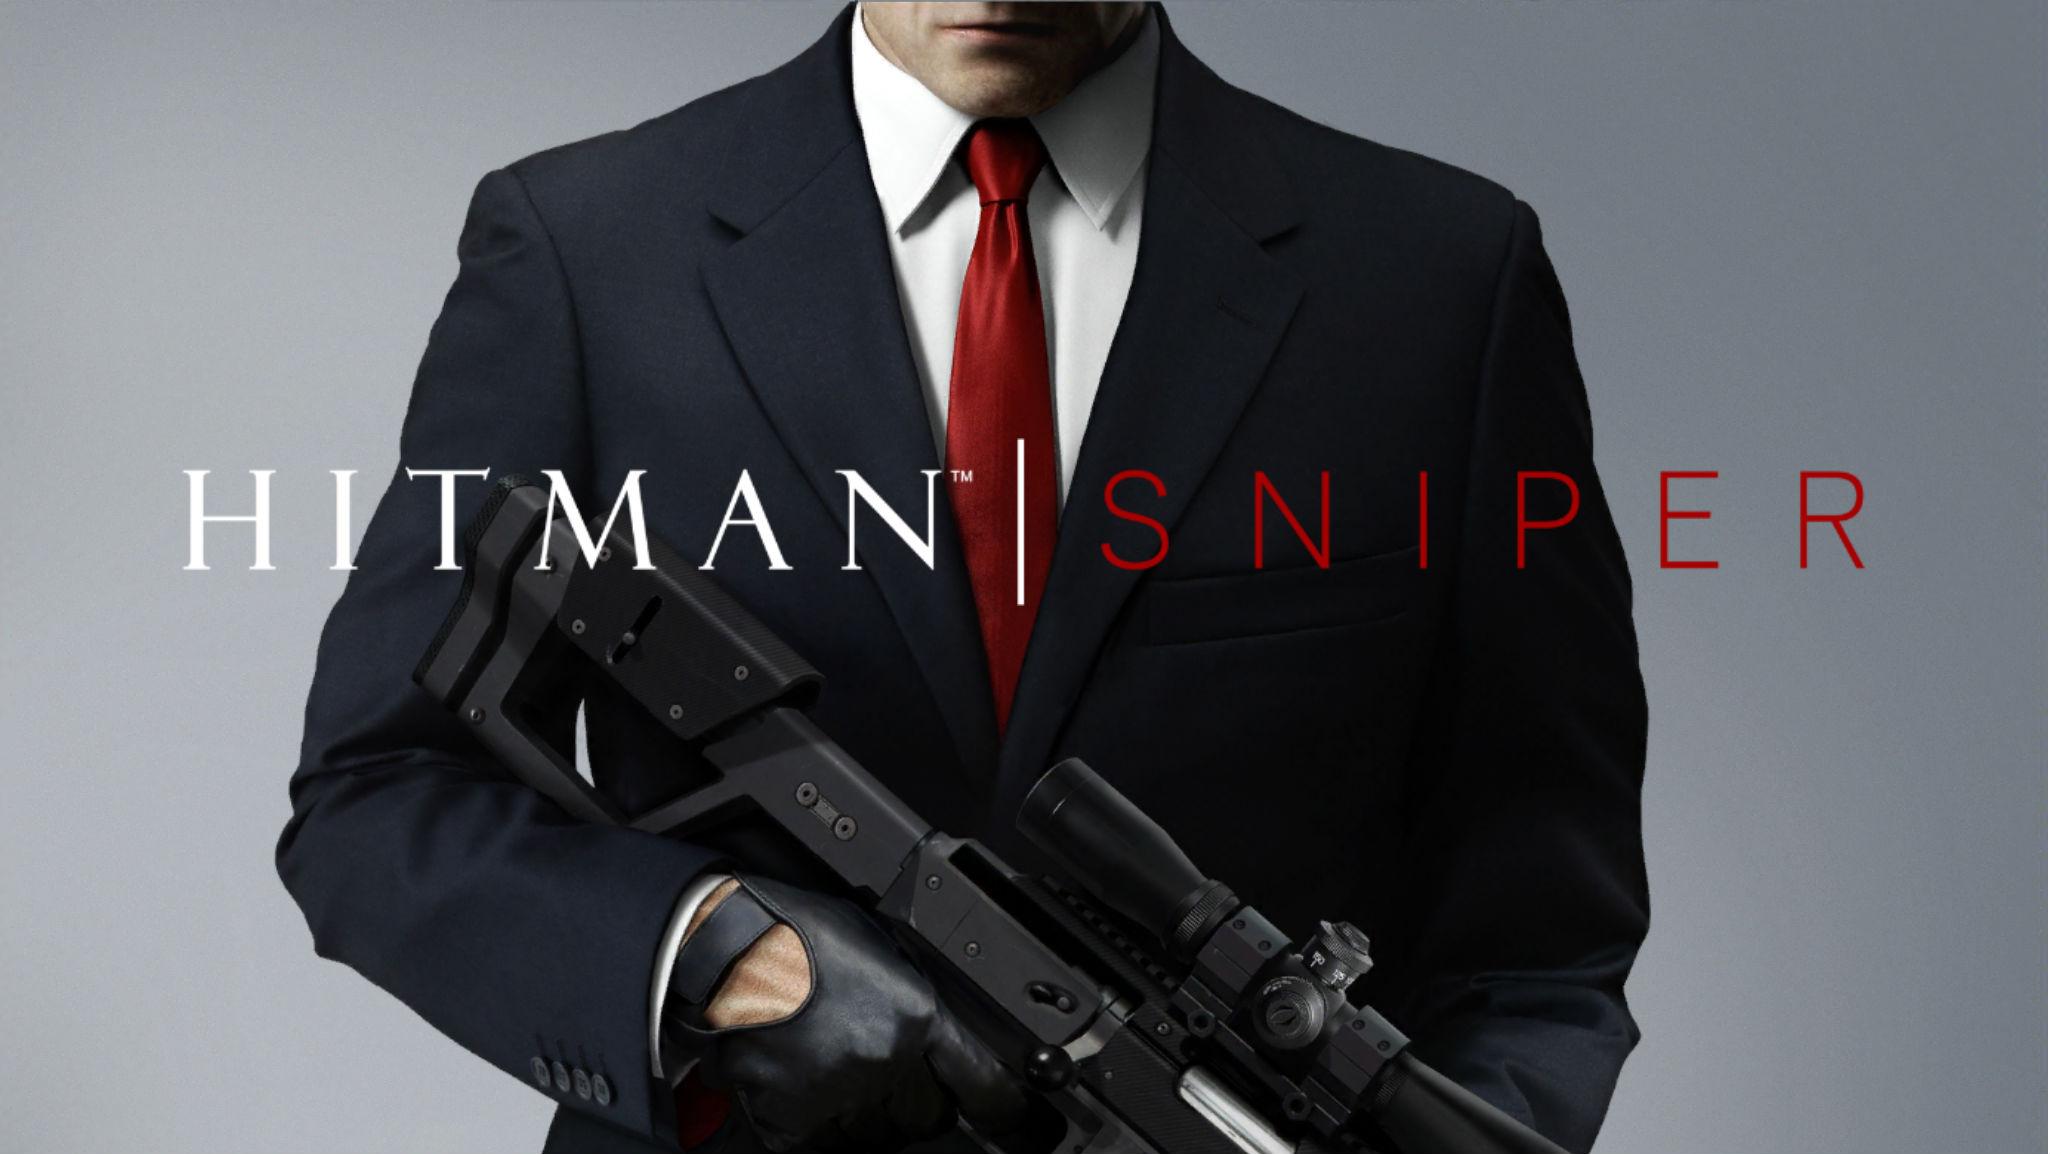 hitman sniper gameplay